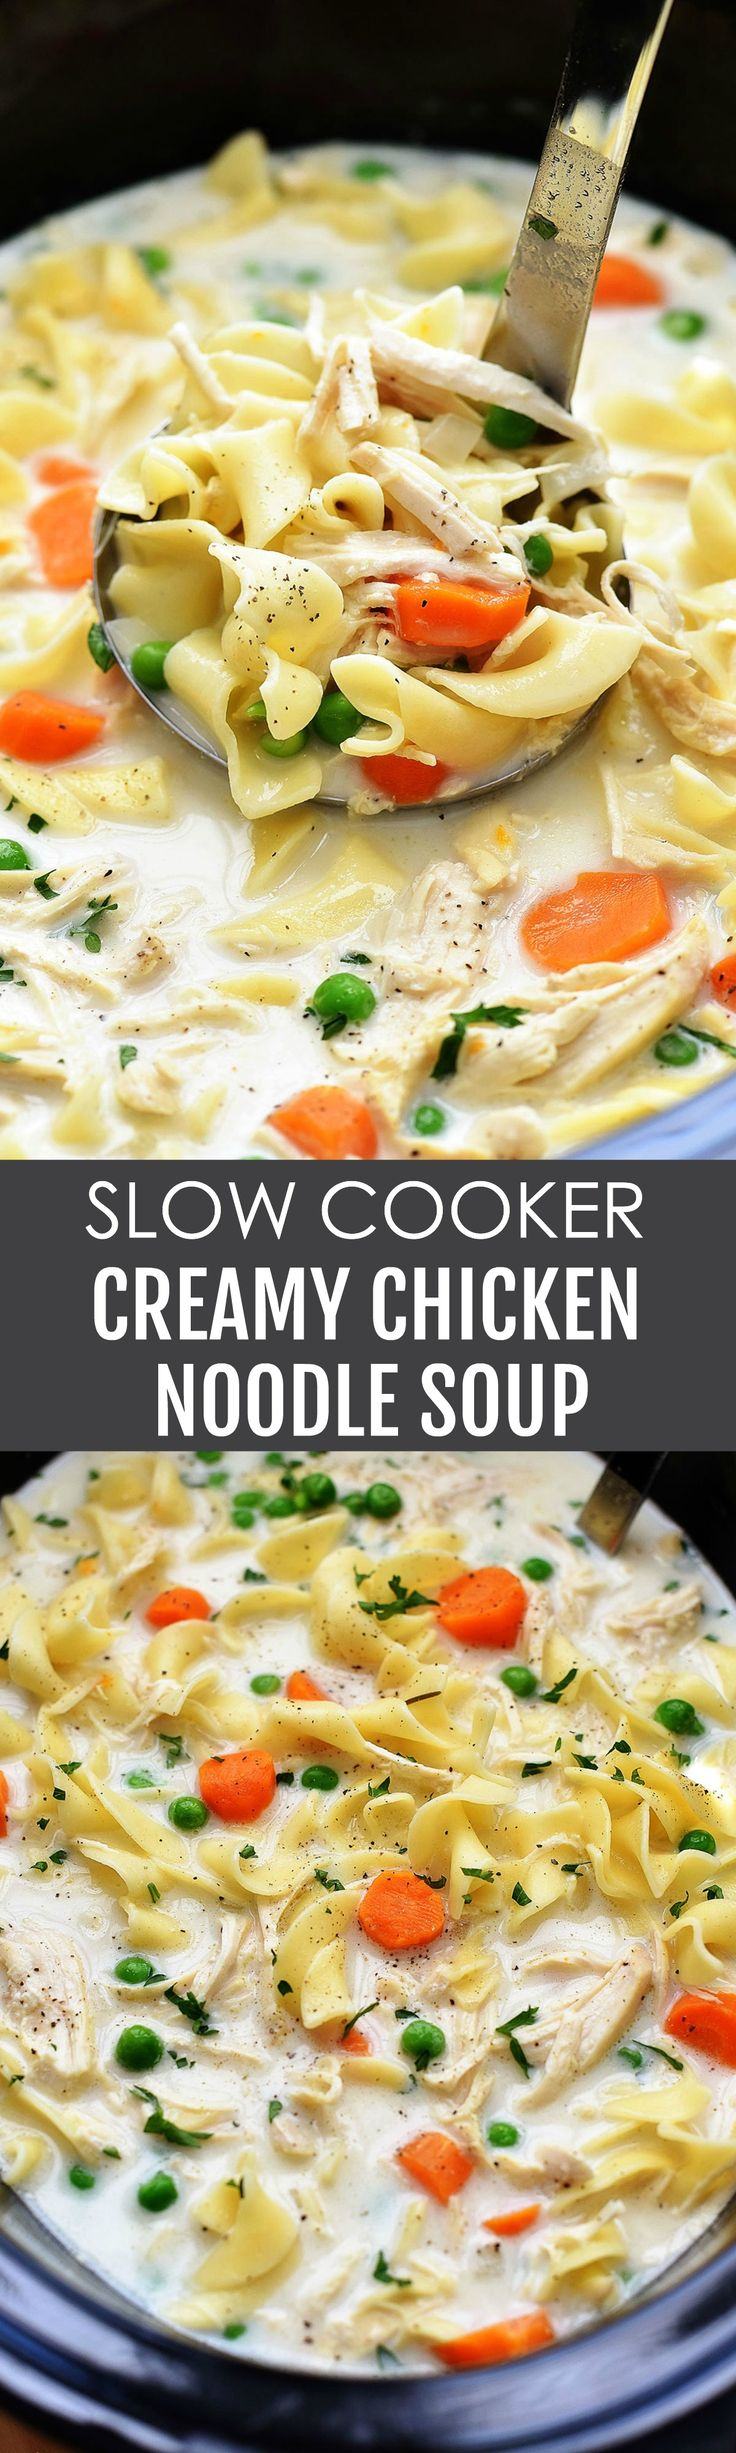 creamy chicken noodles soup